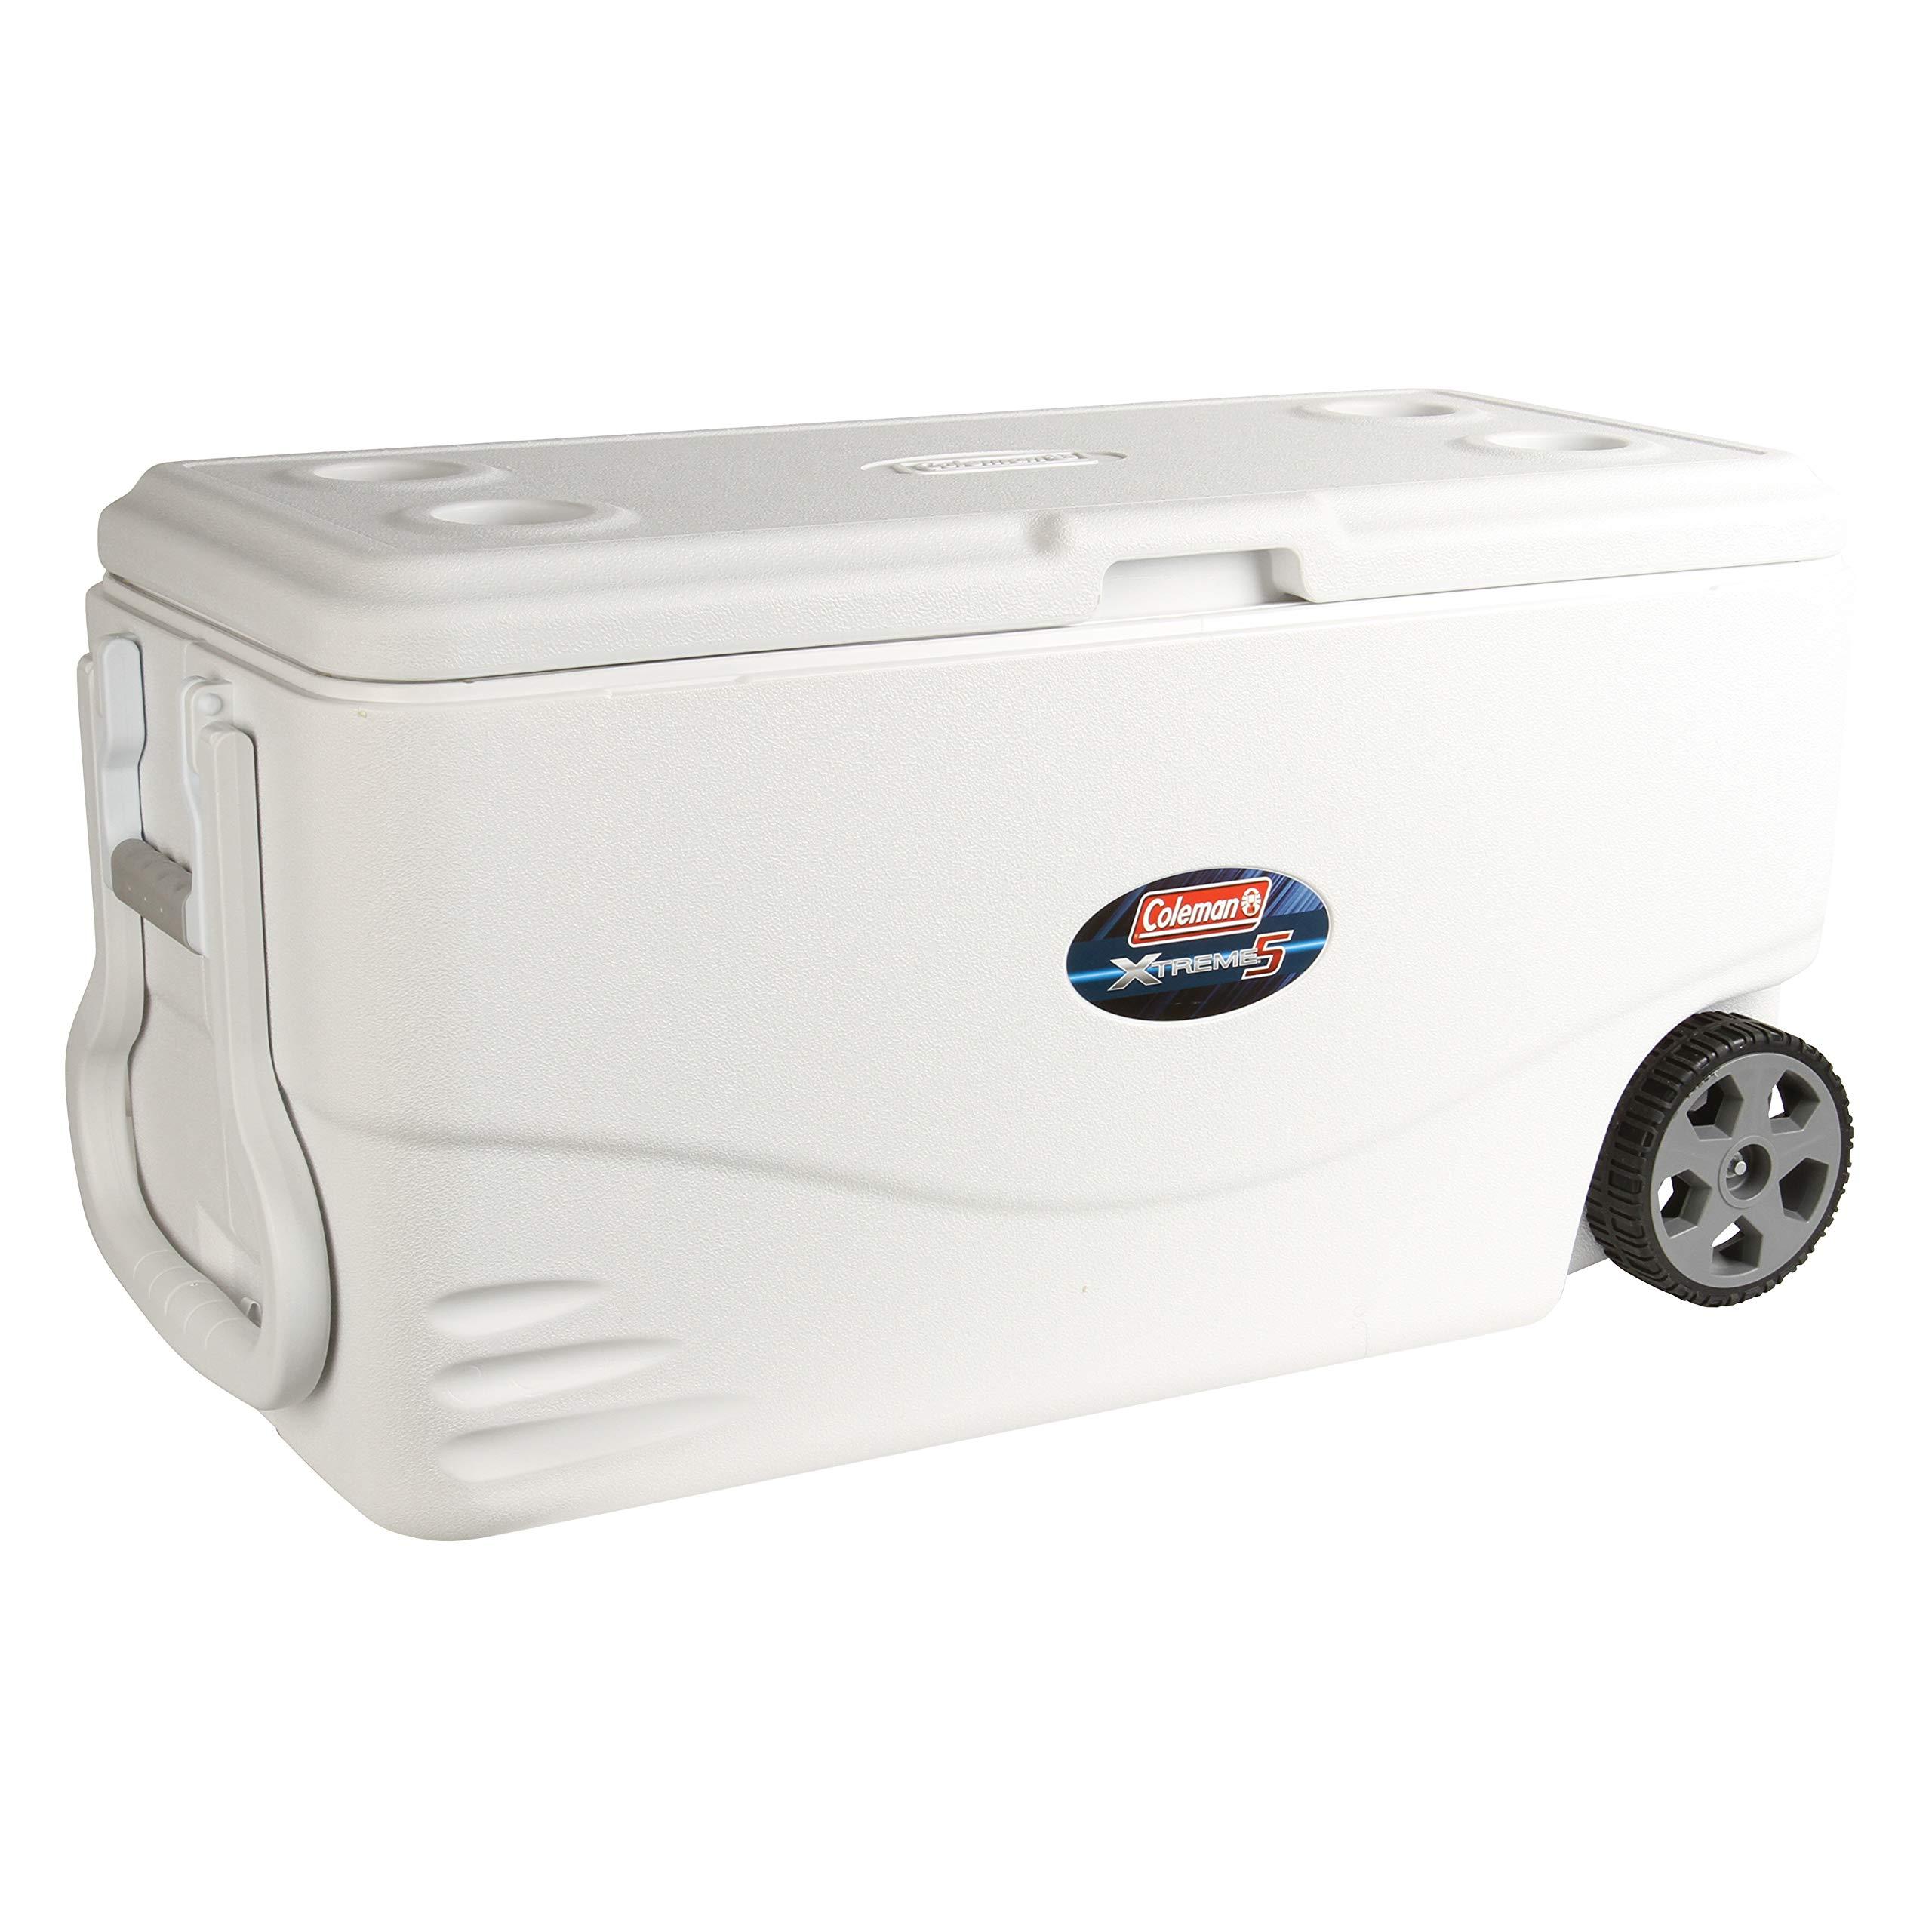 Coleman 100-Quart. Xtreme 5-Wheeled Cooler - White